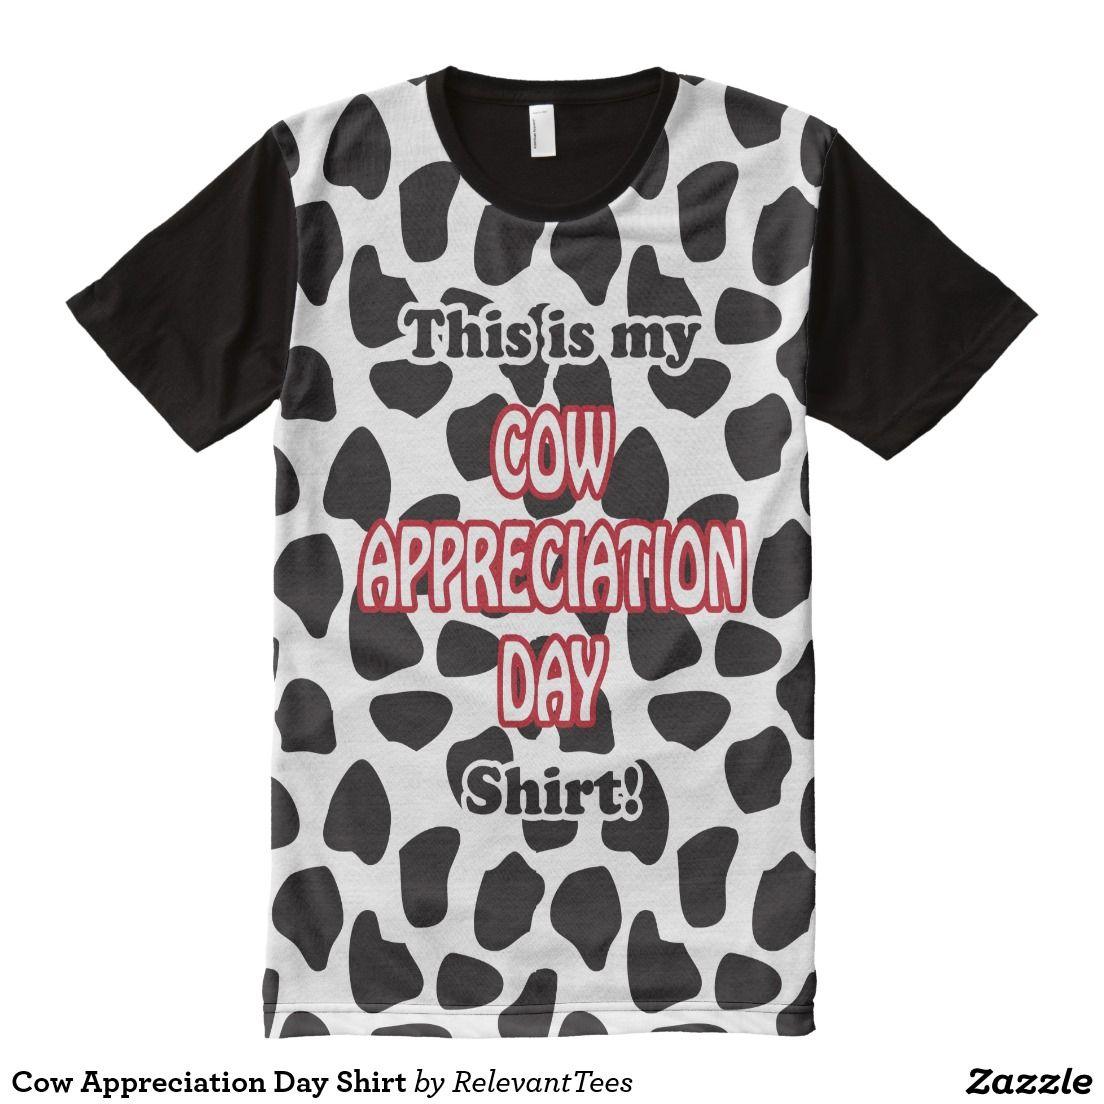 Cow Appreciation Day Shirt Shirts Cow Shirts Cow Appreciation Day